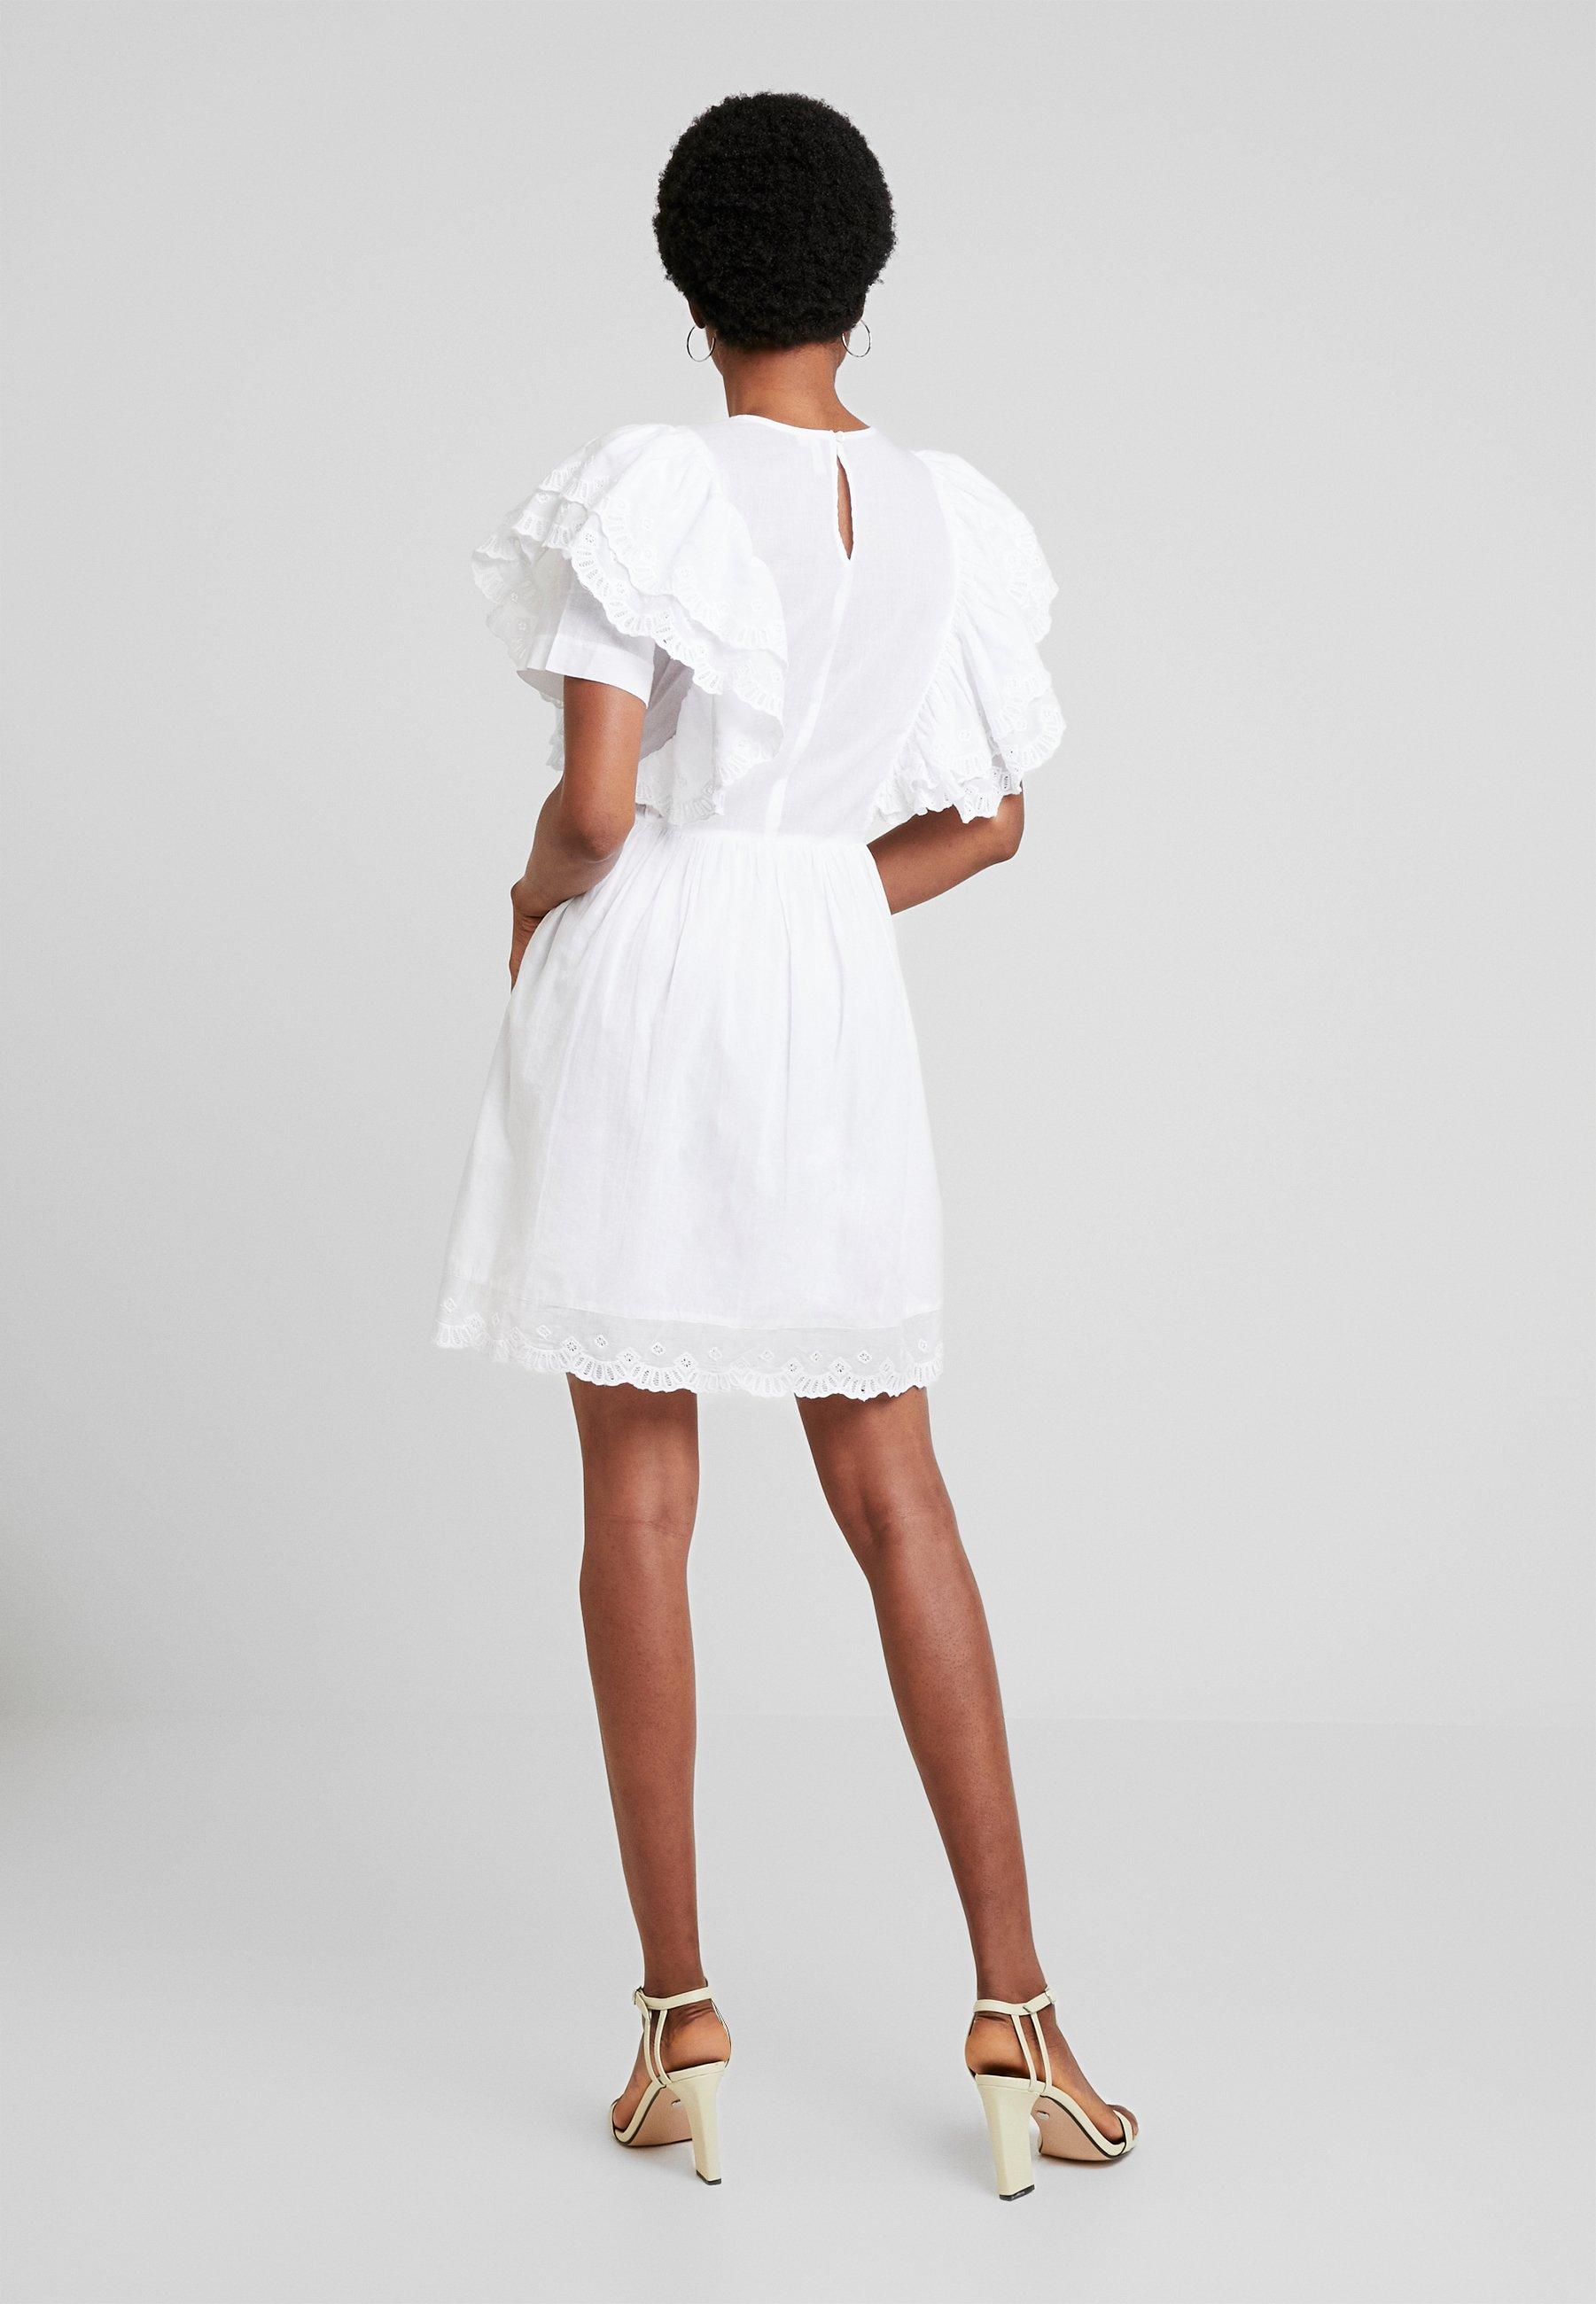 Nly Frill D'été White DressRobe Nelly By Boho vmN08nw